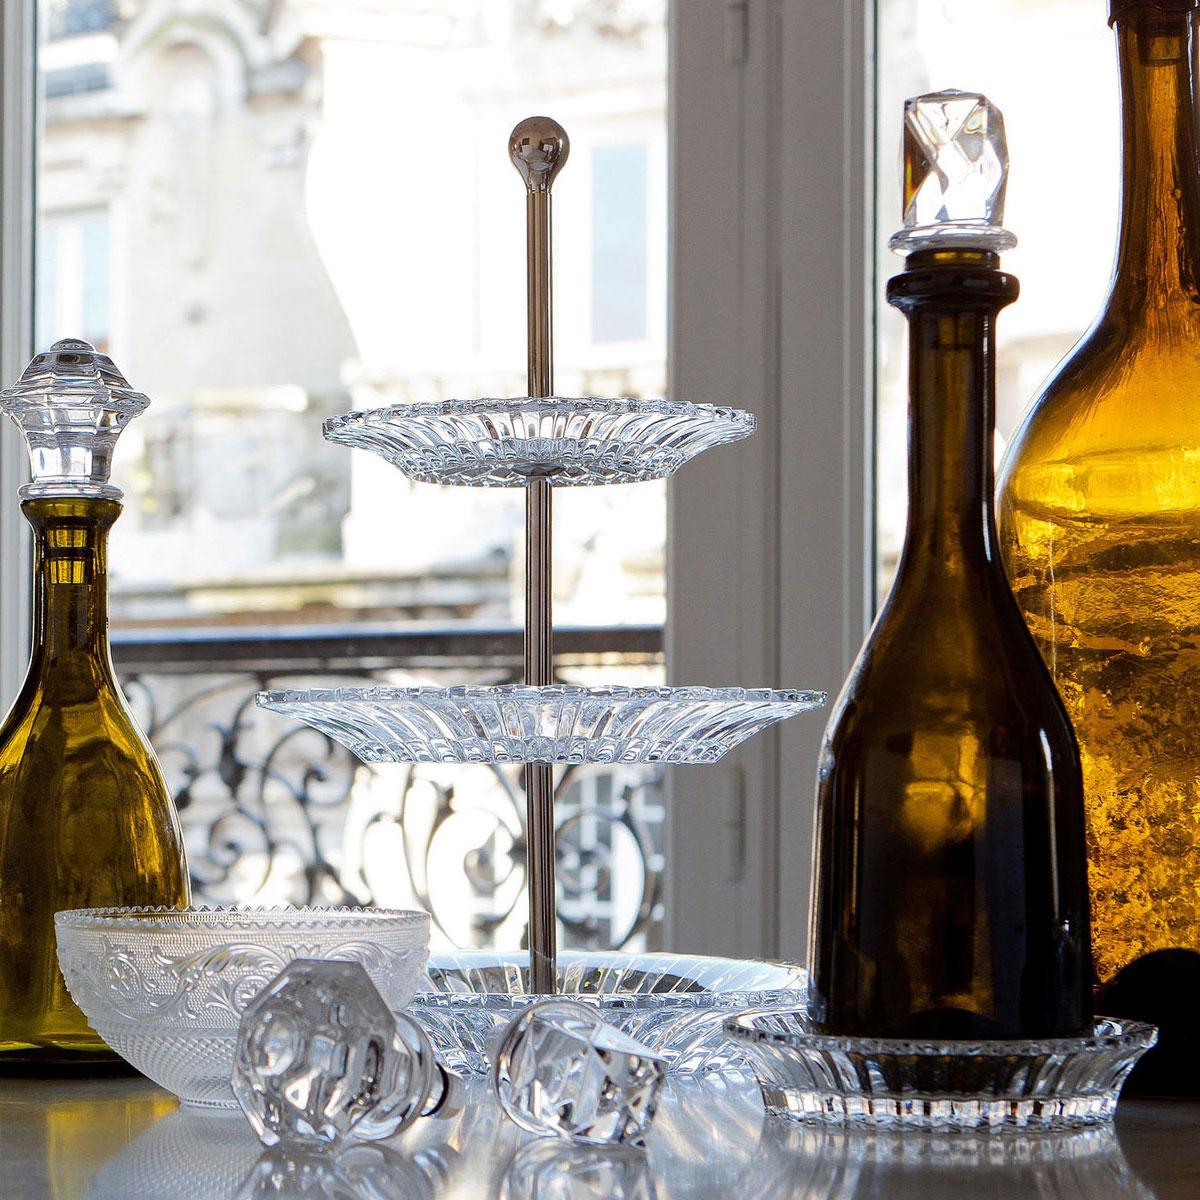 Baccarat Crystal Universal Tip-Top Louxor Bottle Stopper